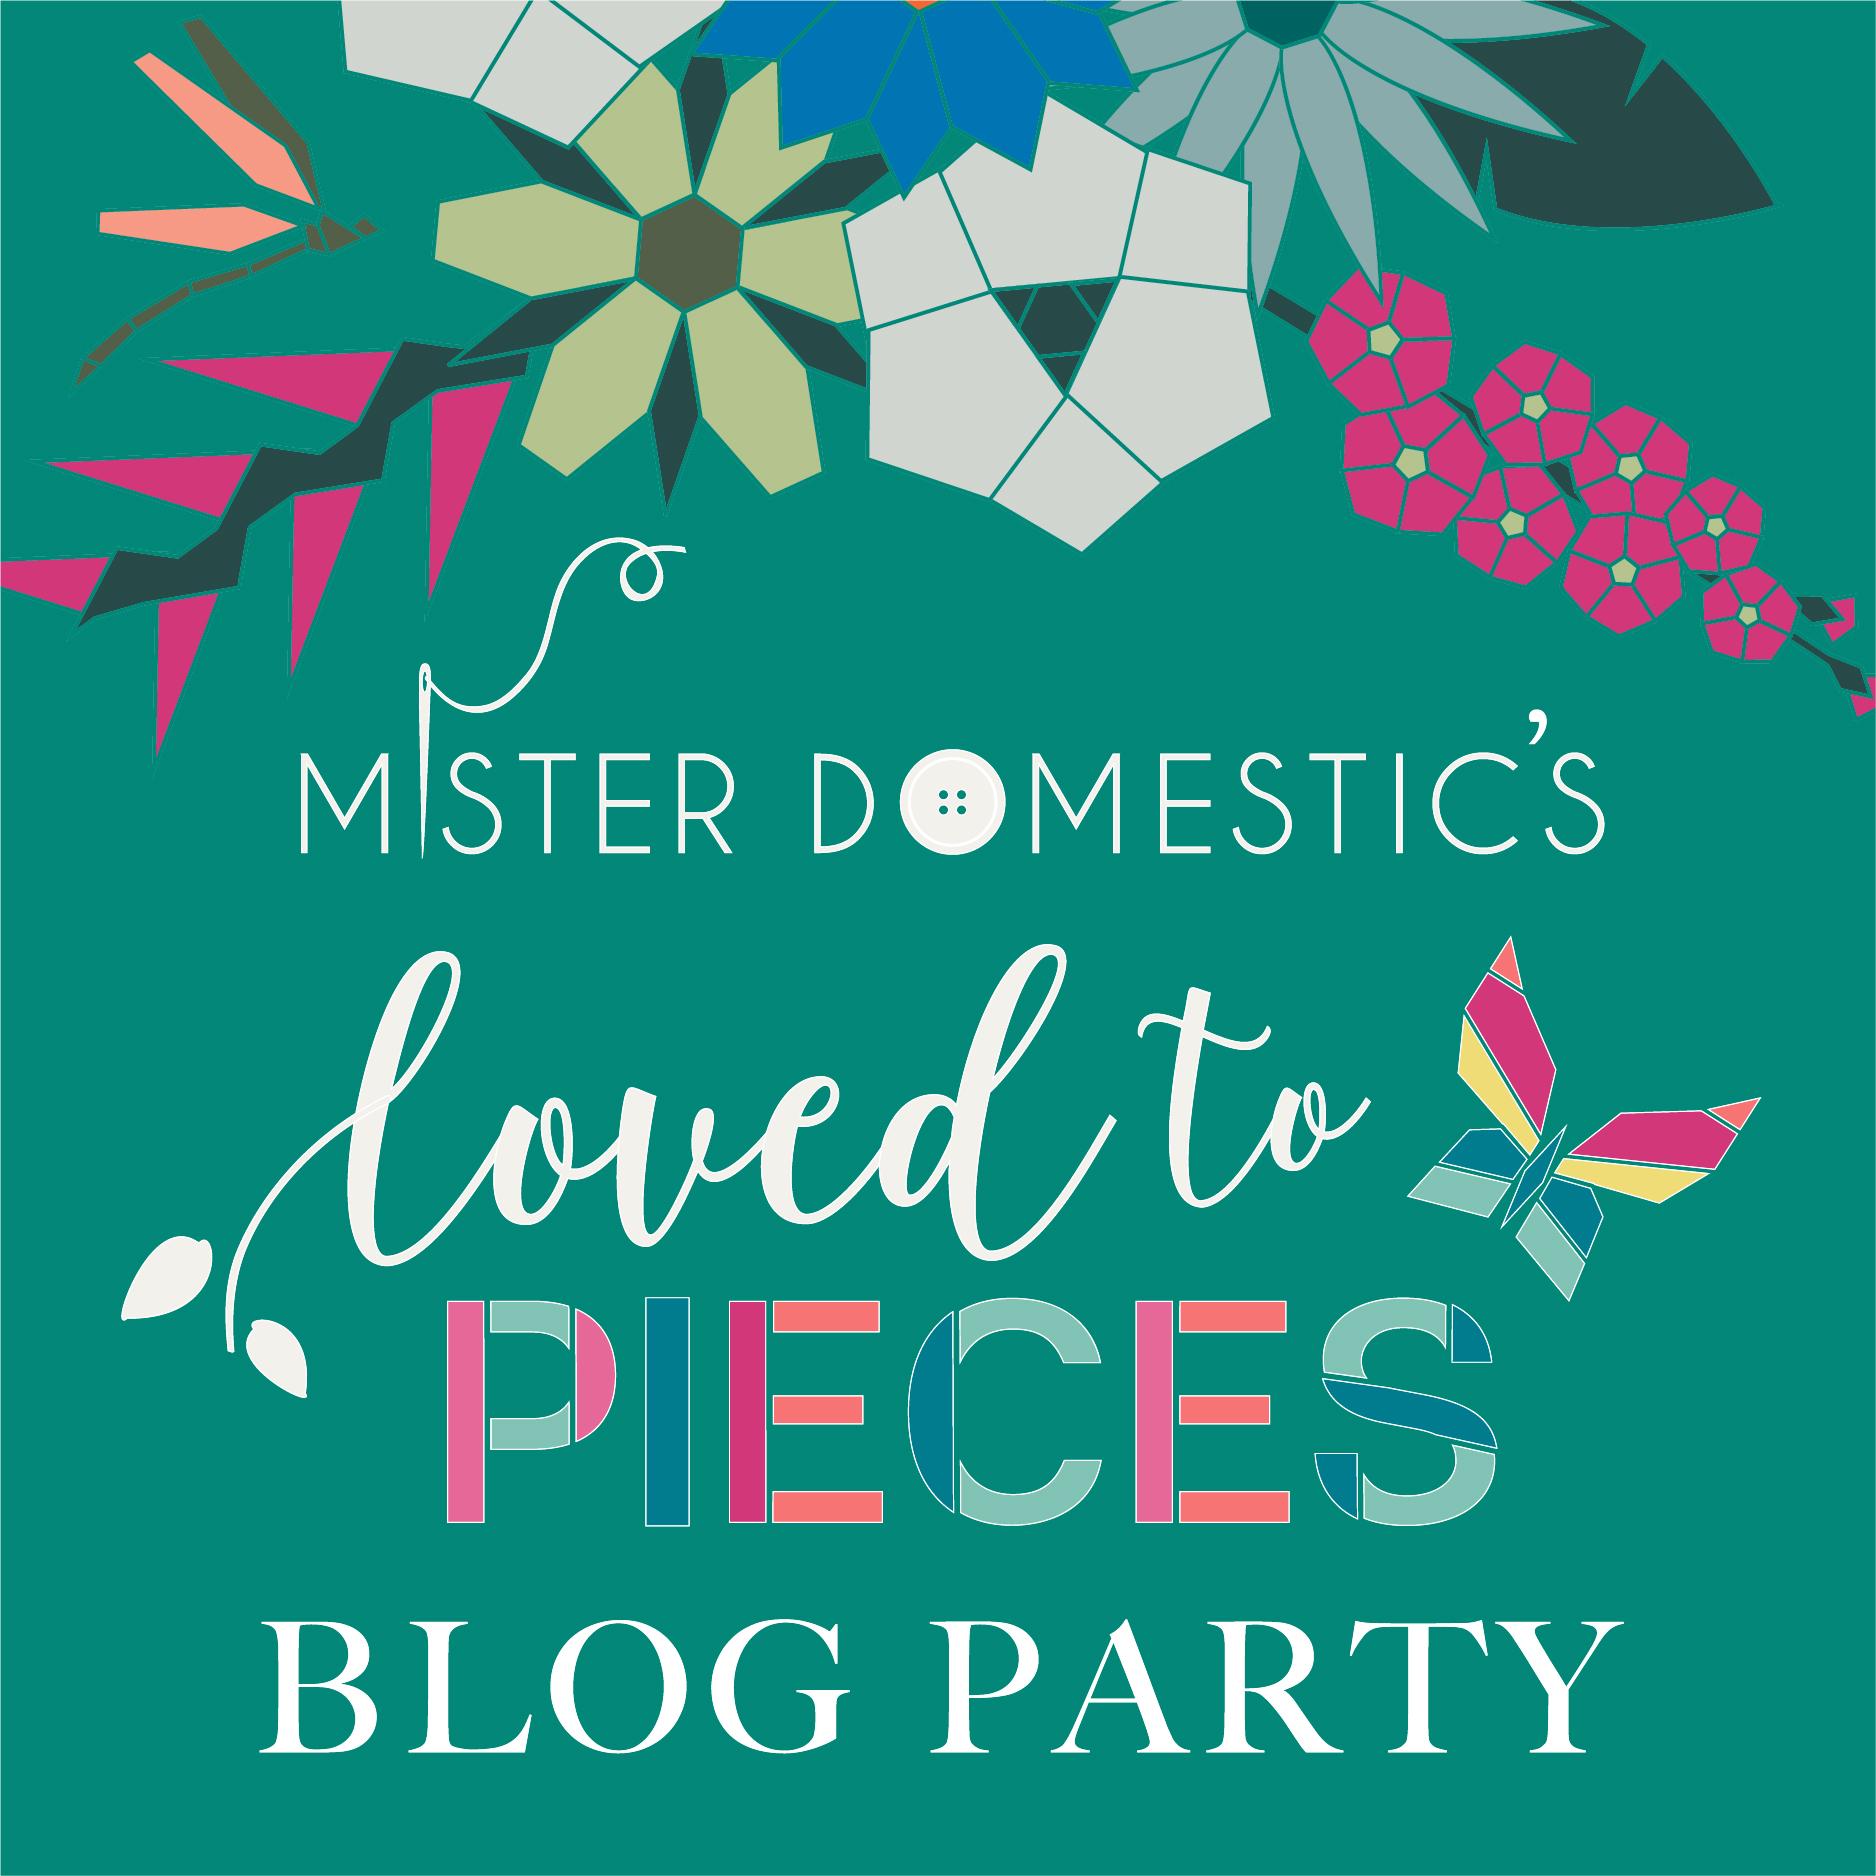 LTP Blog Party Square Banner.jpg